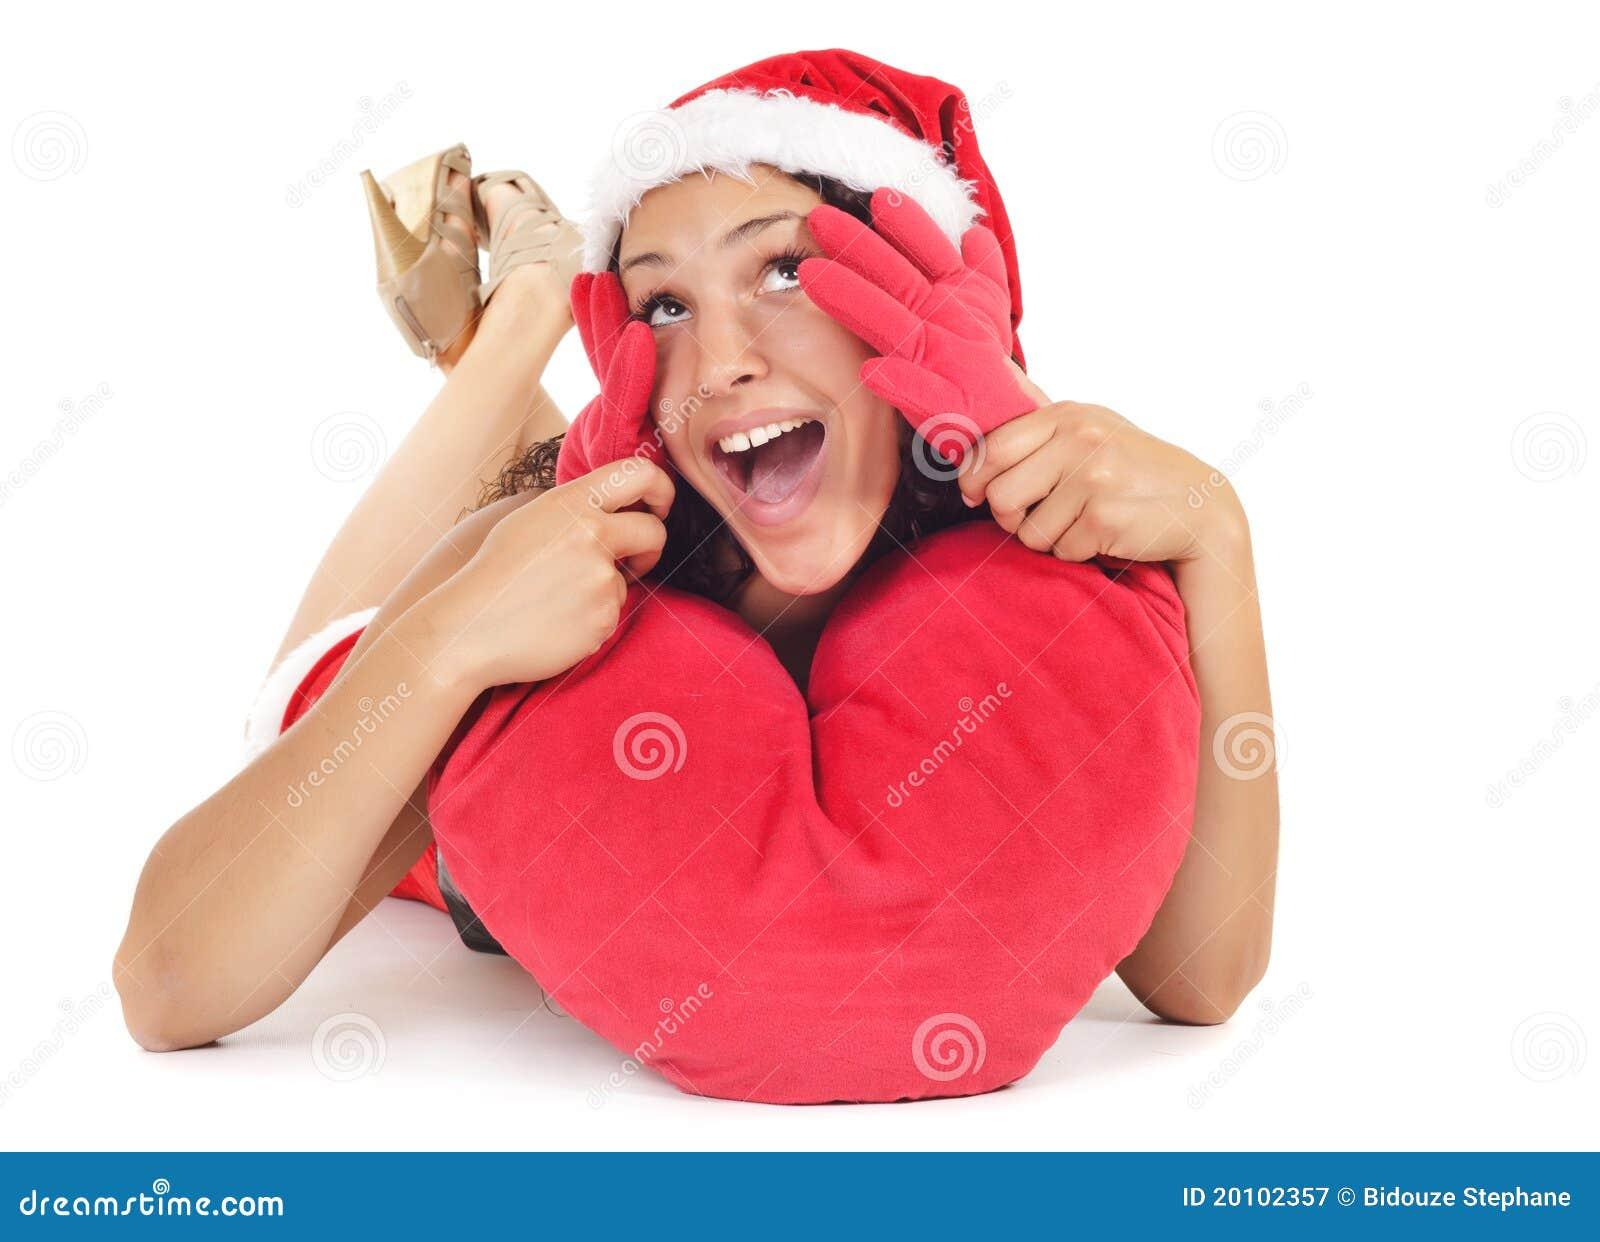 santa single women Meet santa cruz singles online & chat in the forums dhu is a 100% free dating site to find personals & casual encounters in santa cruz.